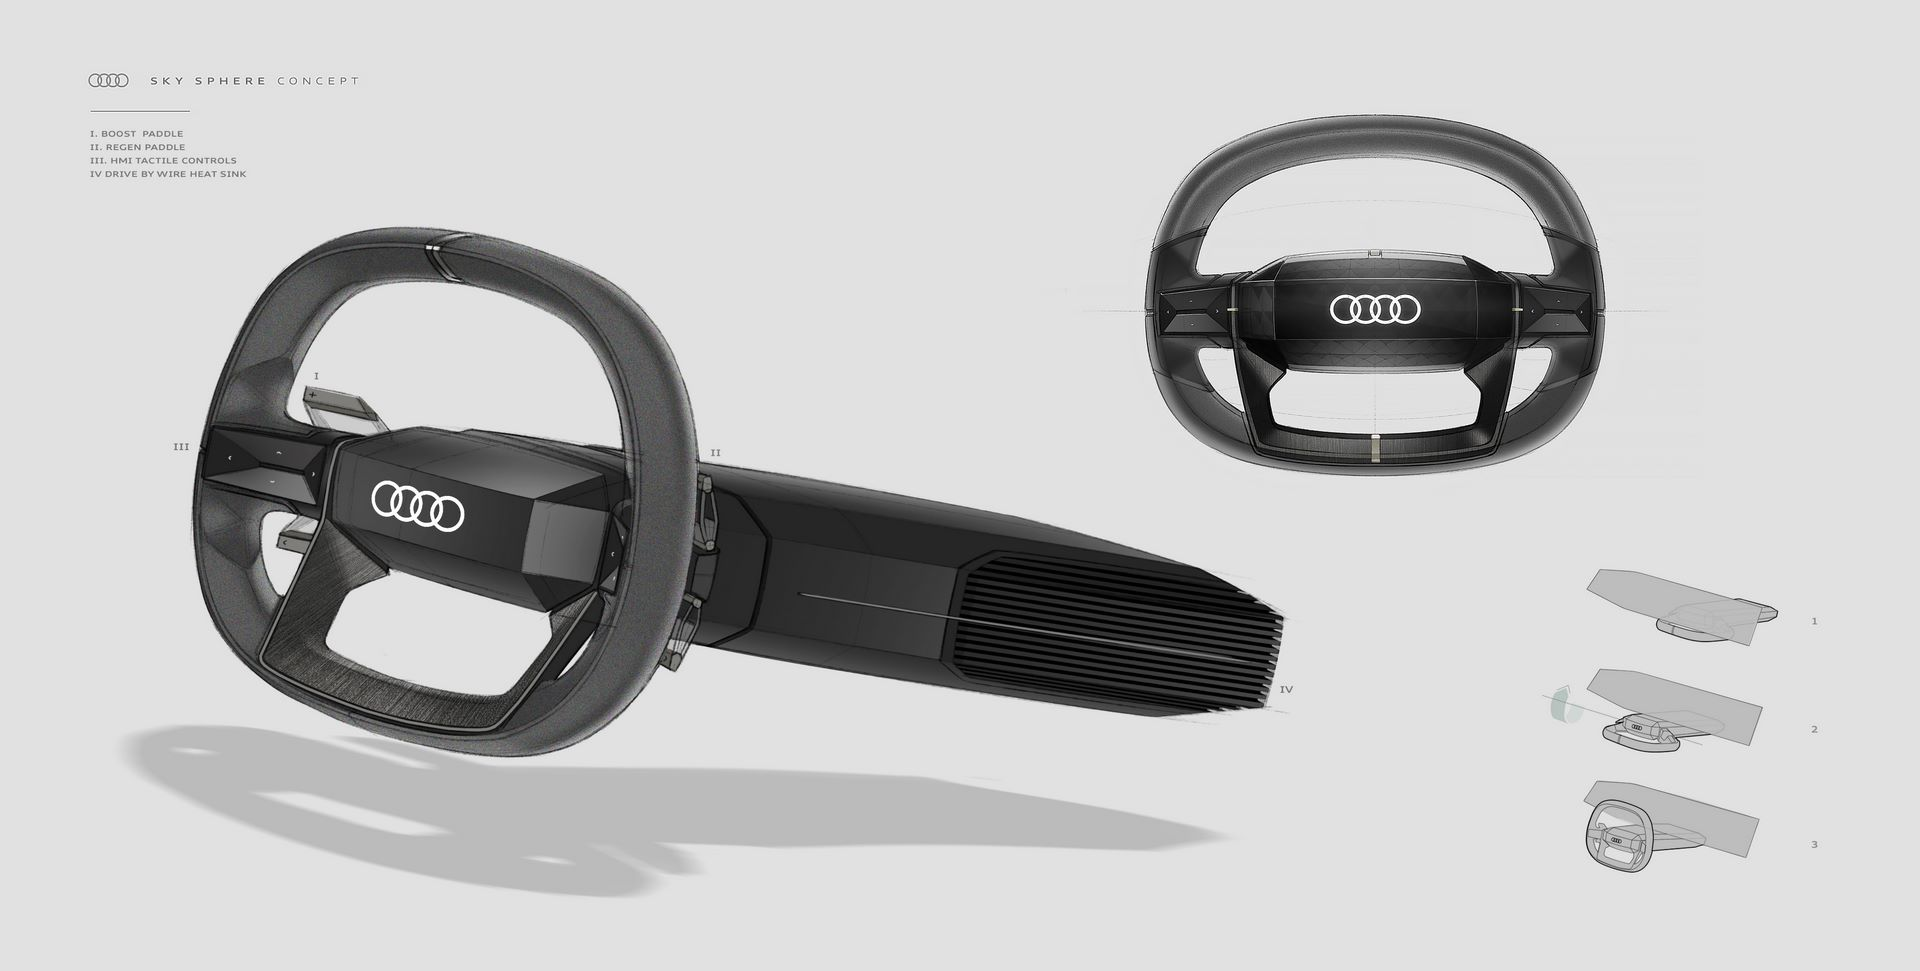 Audi-Skysphere-Concept-46